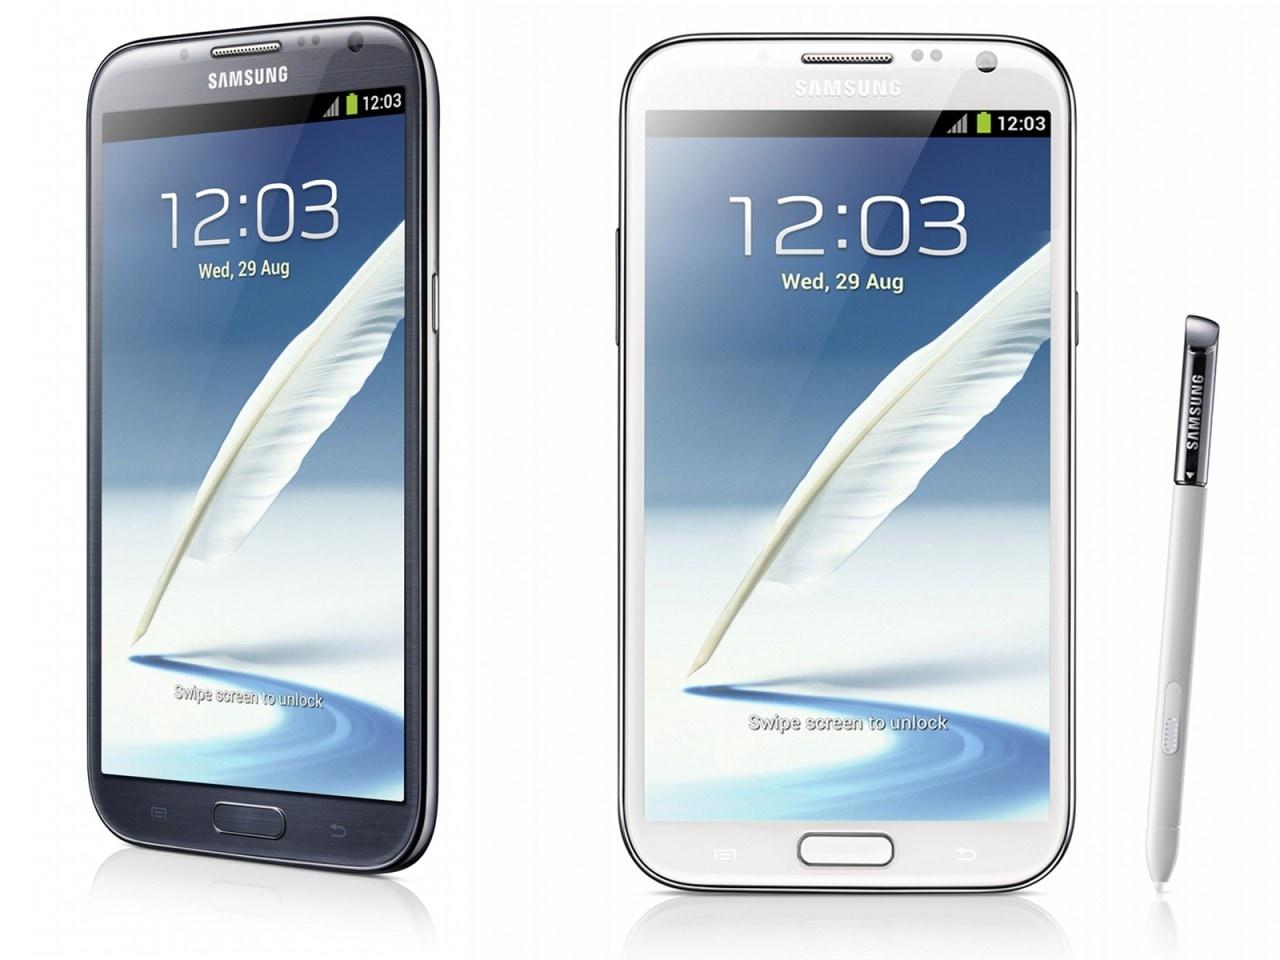 Samsung Galaxy Note II a 329€ da Marcopolo Expert